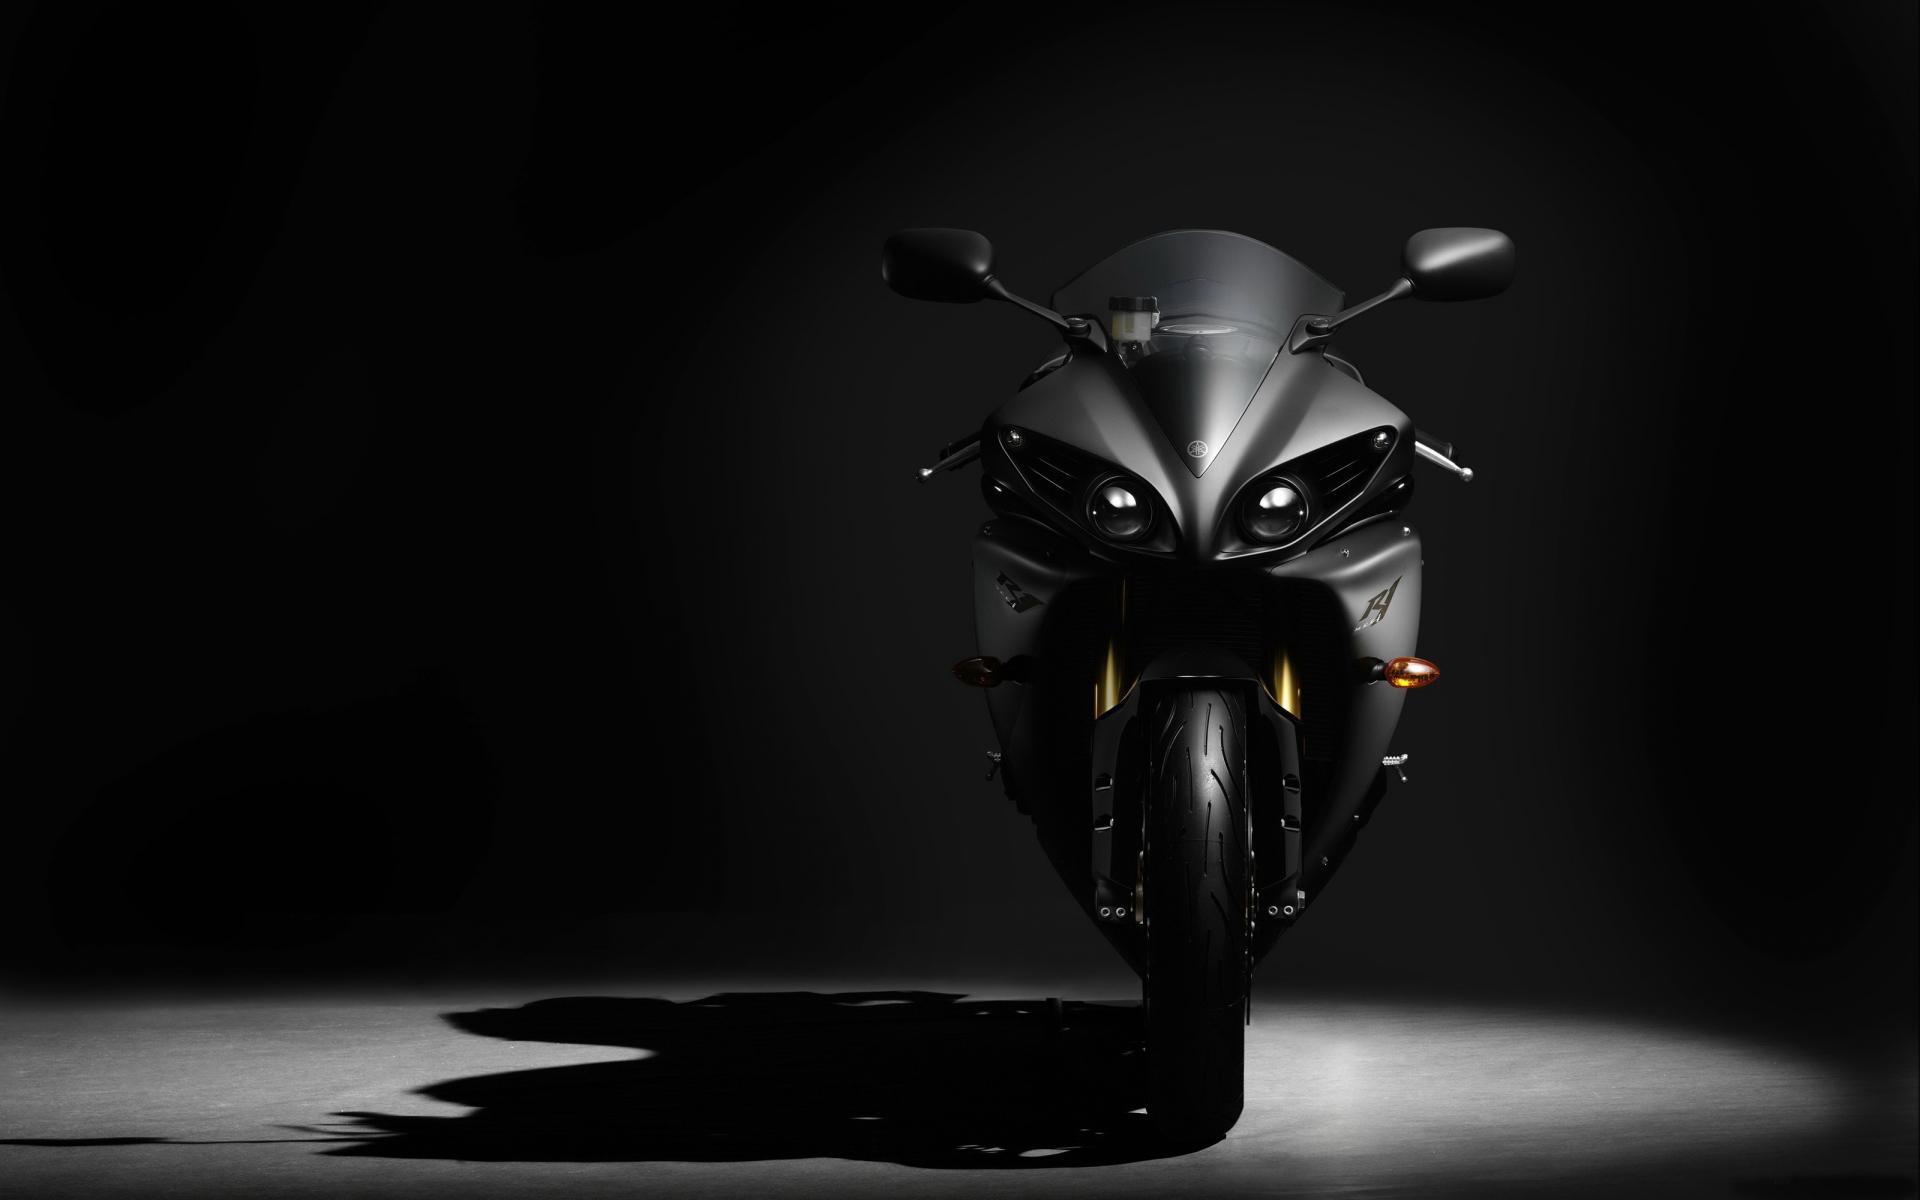 Black Bike Backgrounds